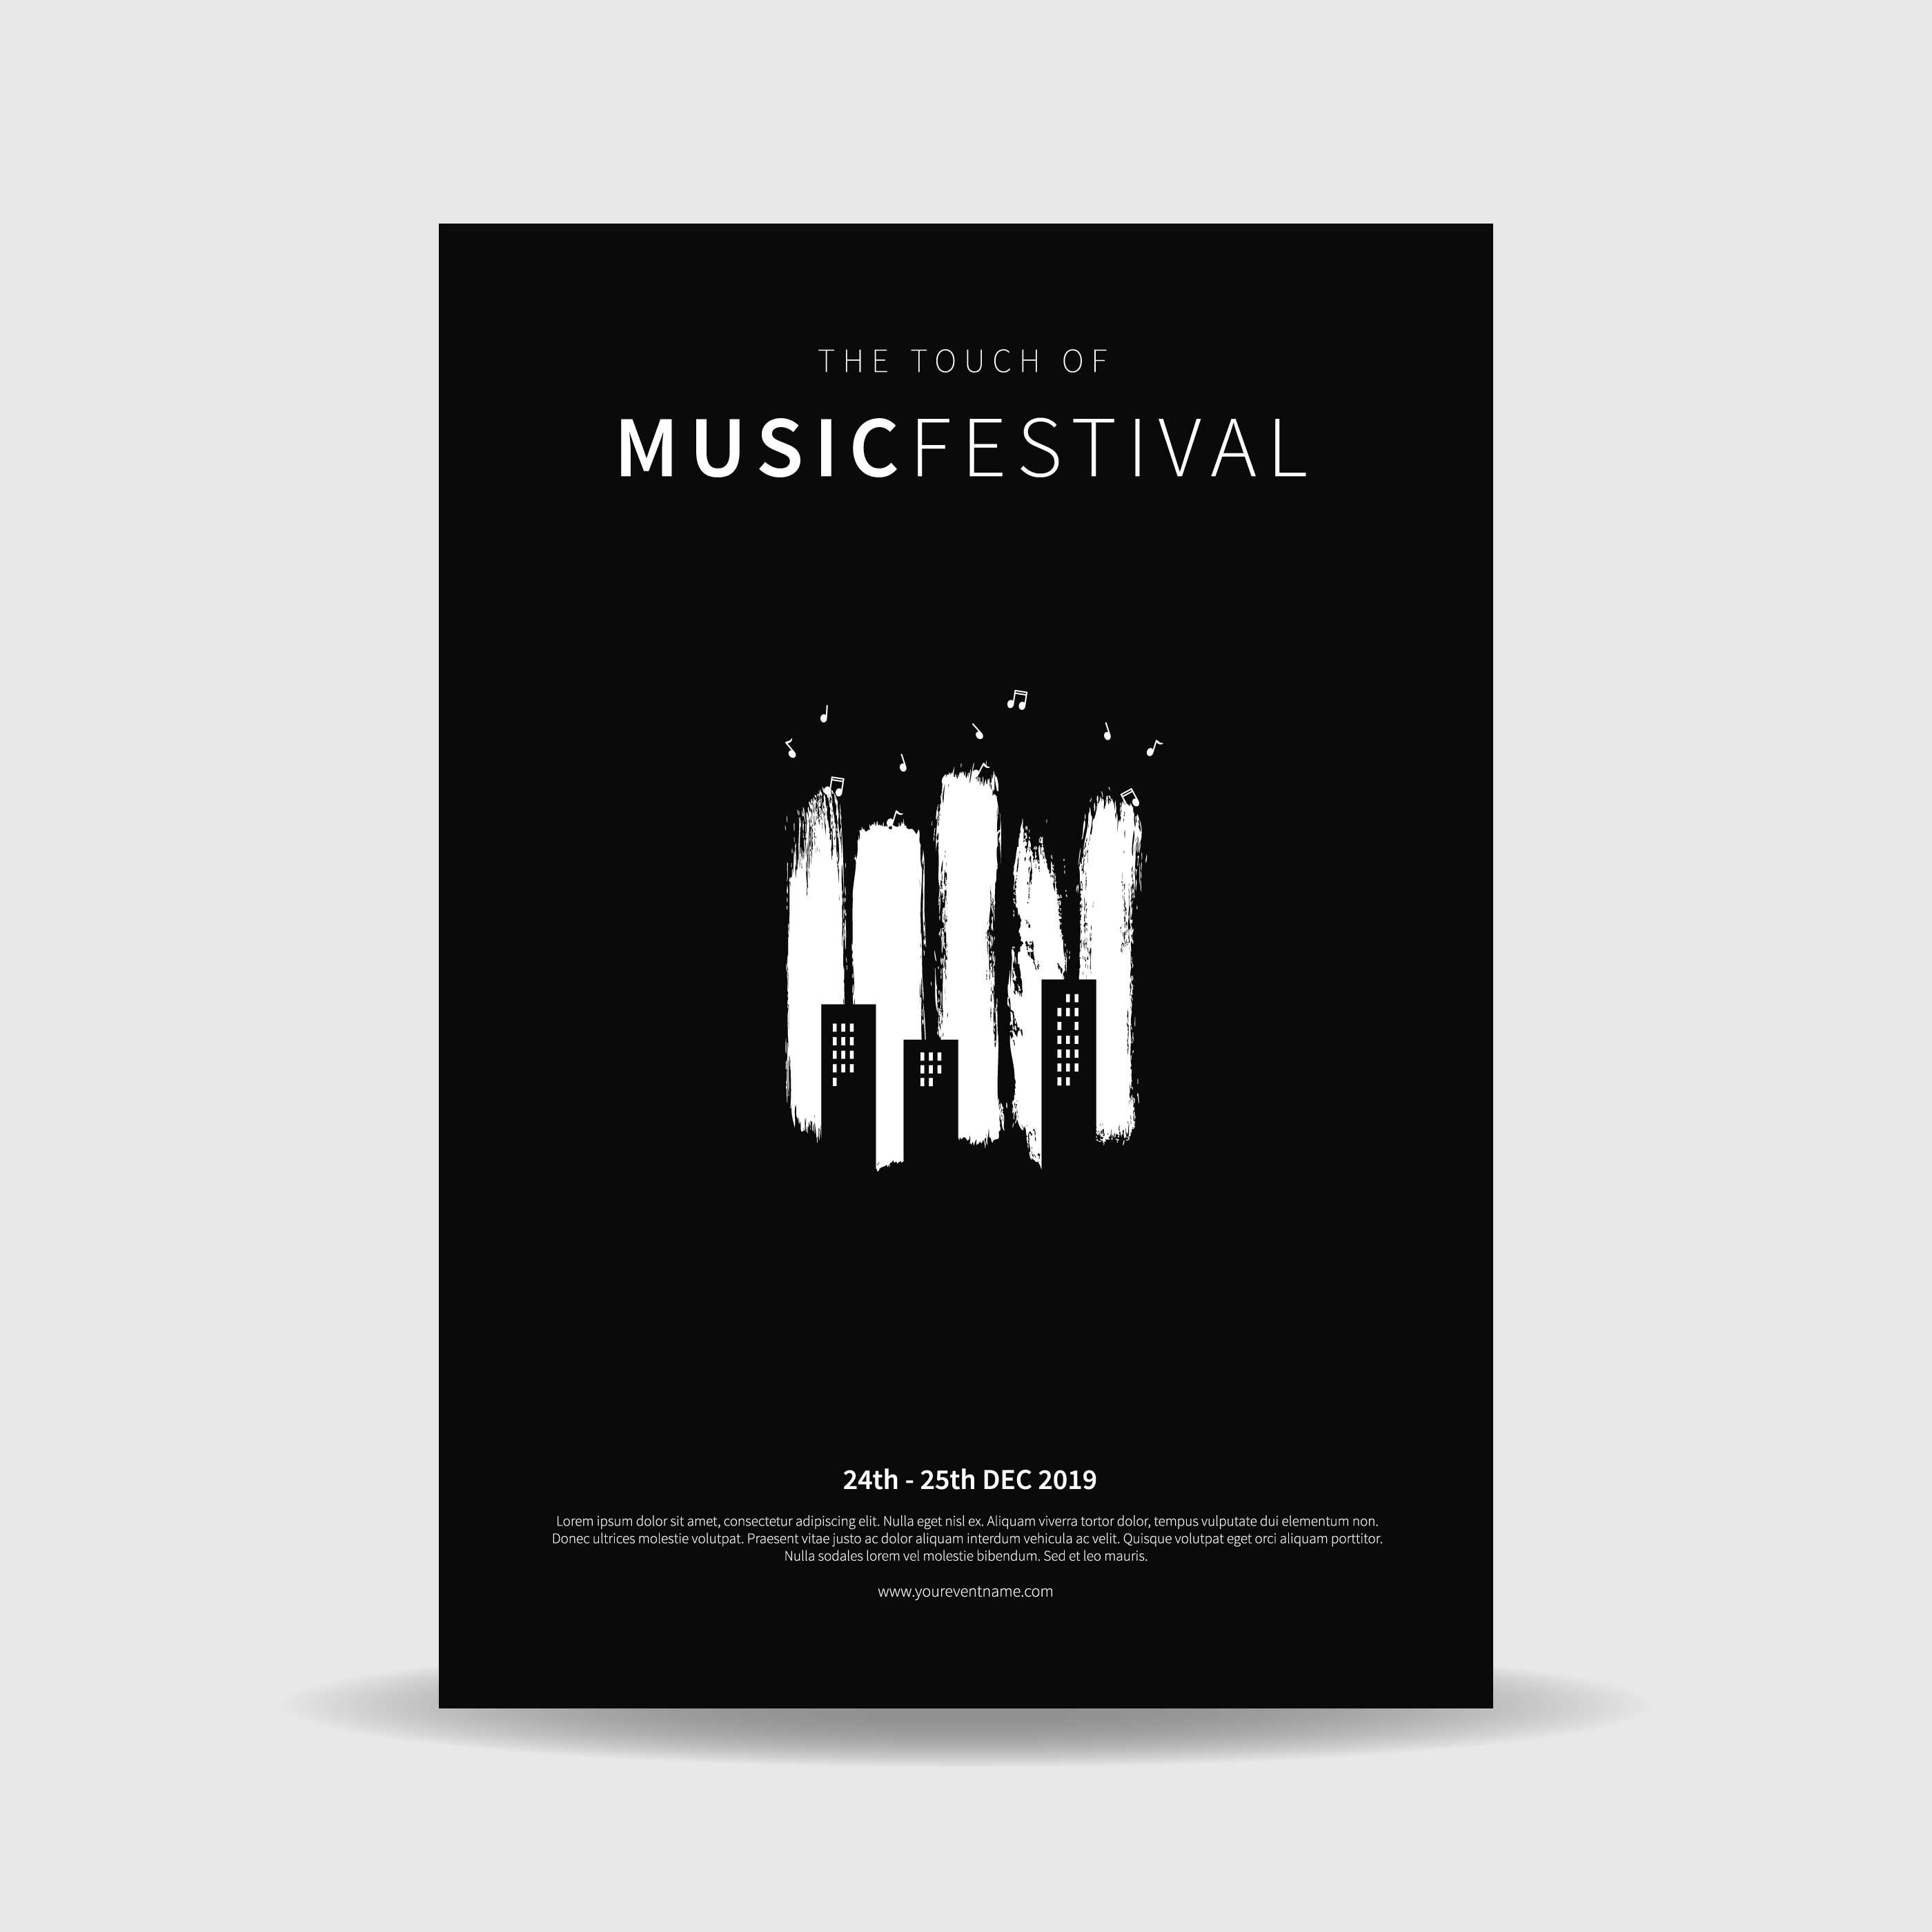 Music Festival Poster Vector - Download Free Vector Art ...